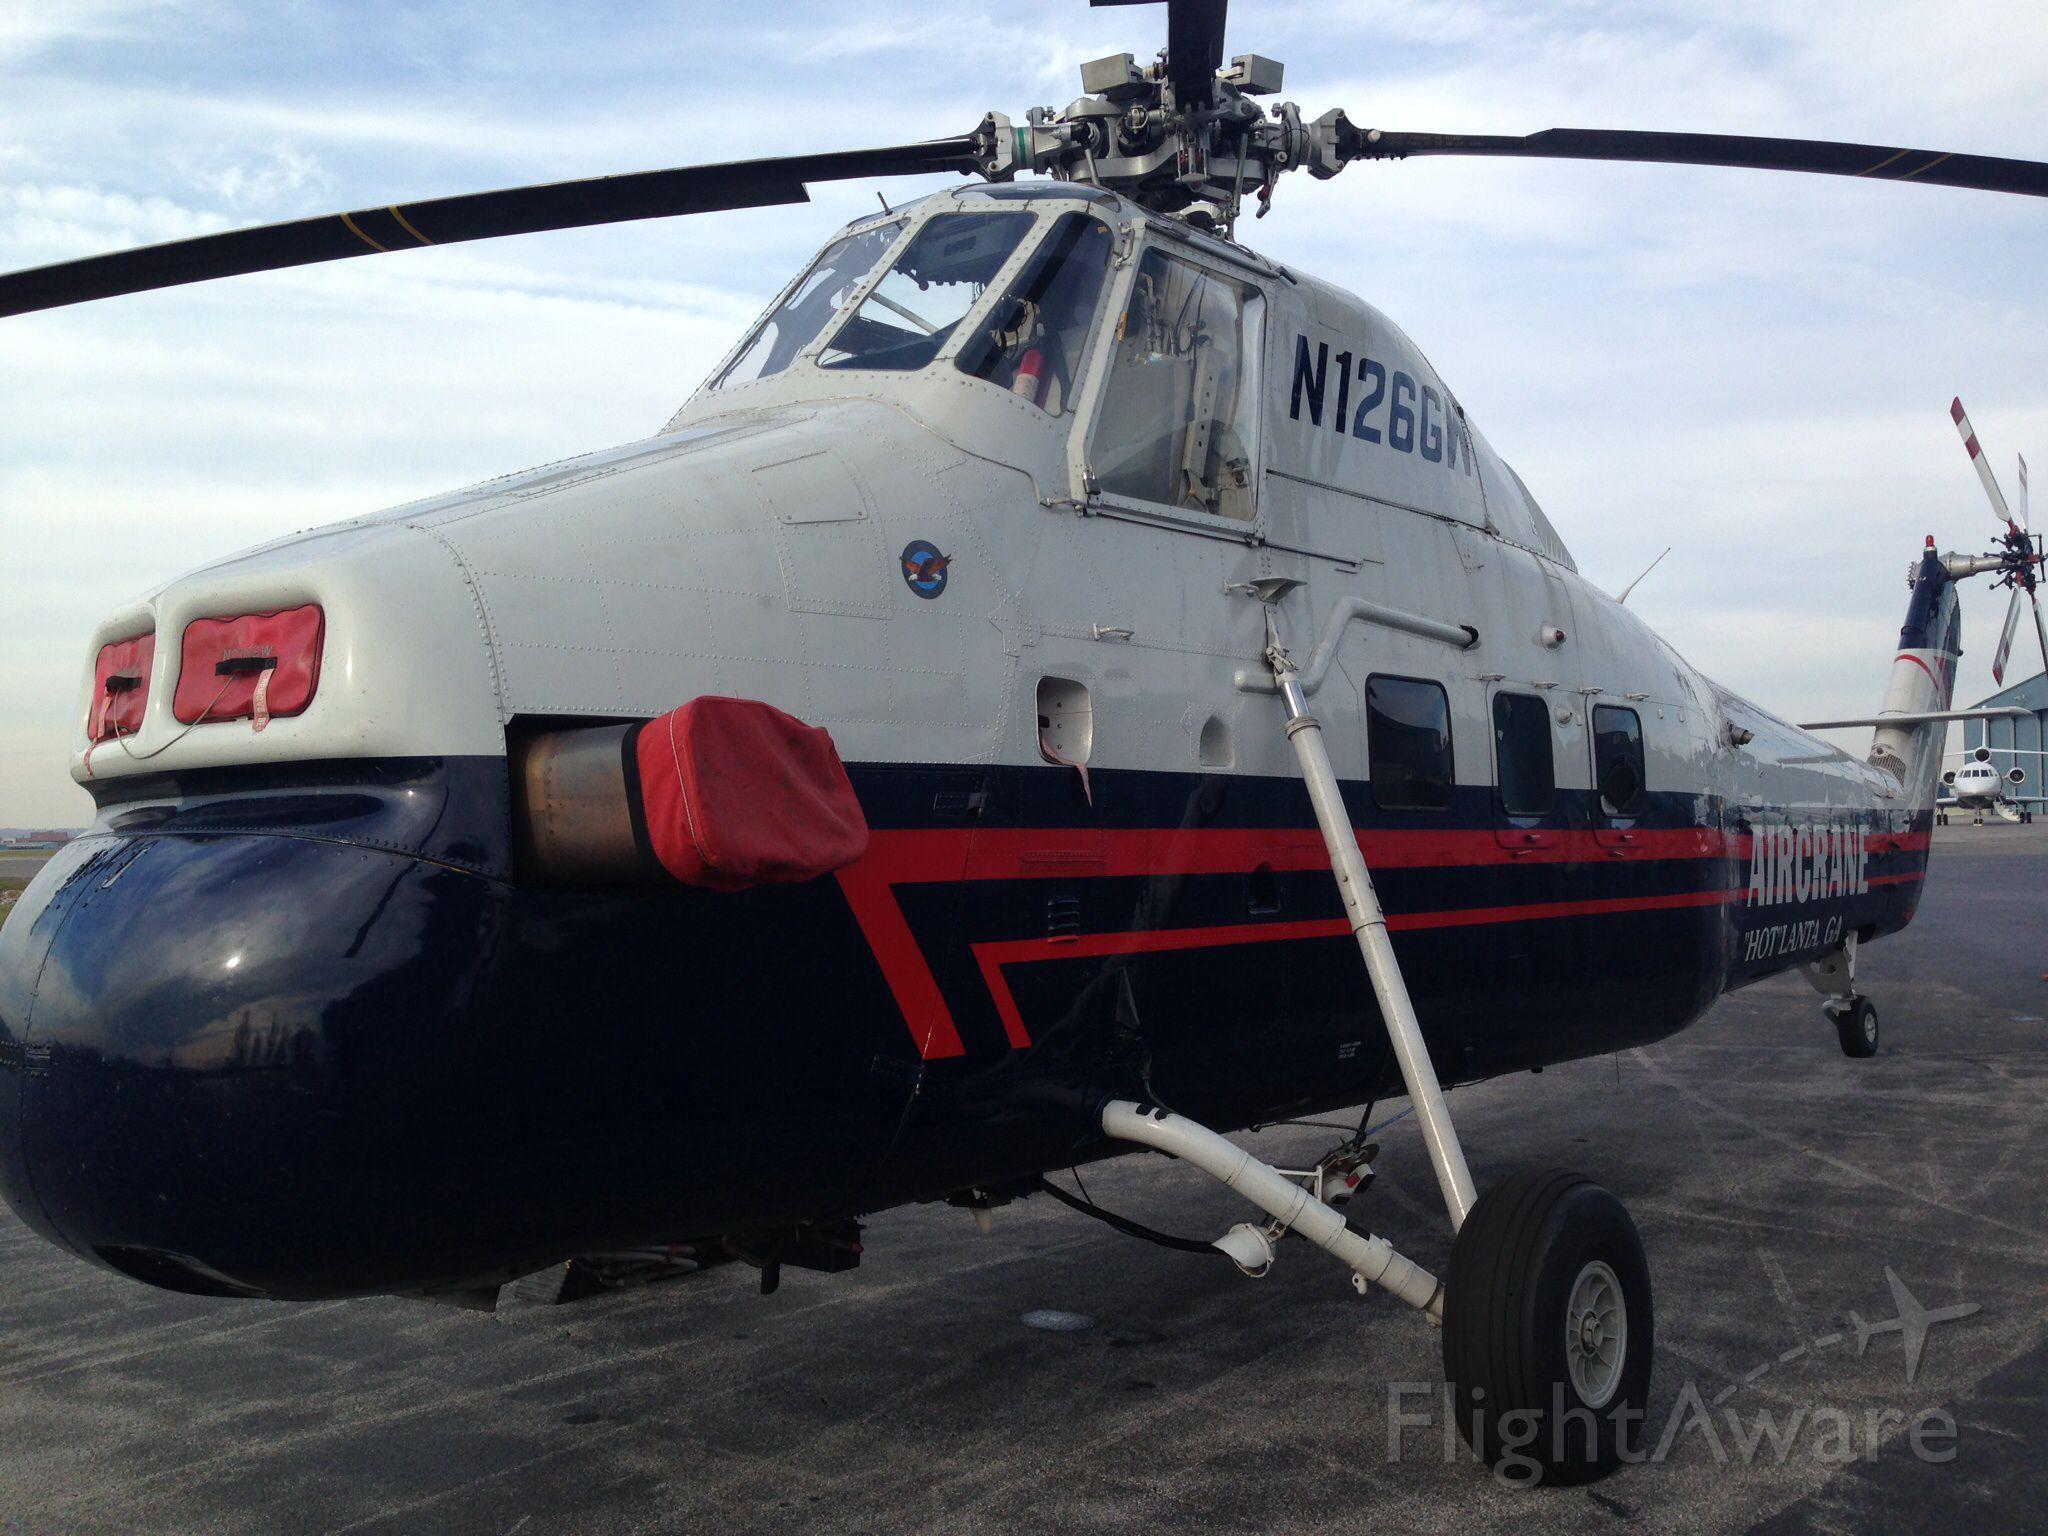 BEAGLE-AUSTER B-206 (N126GW)